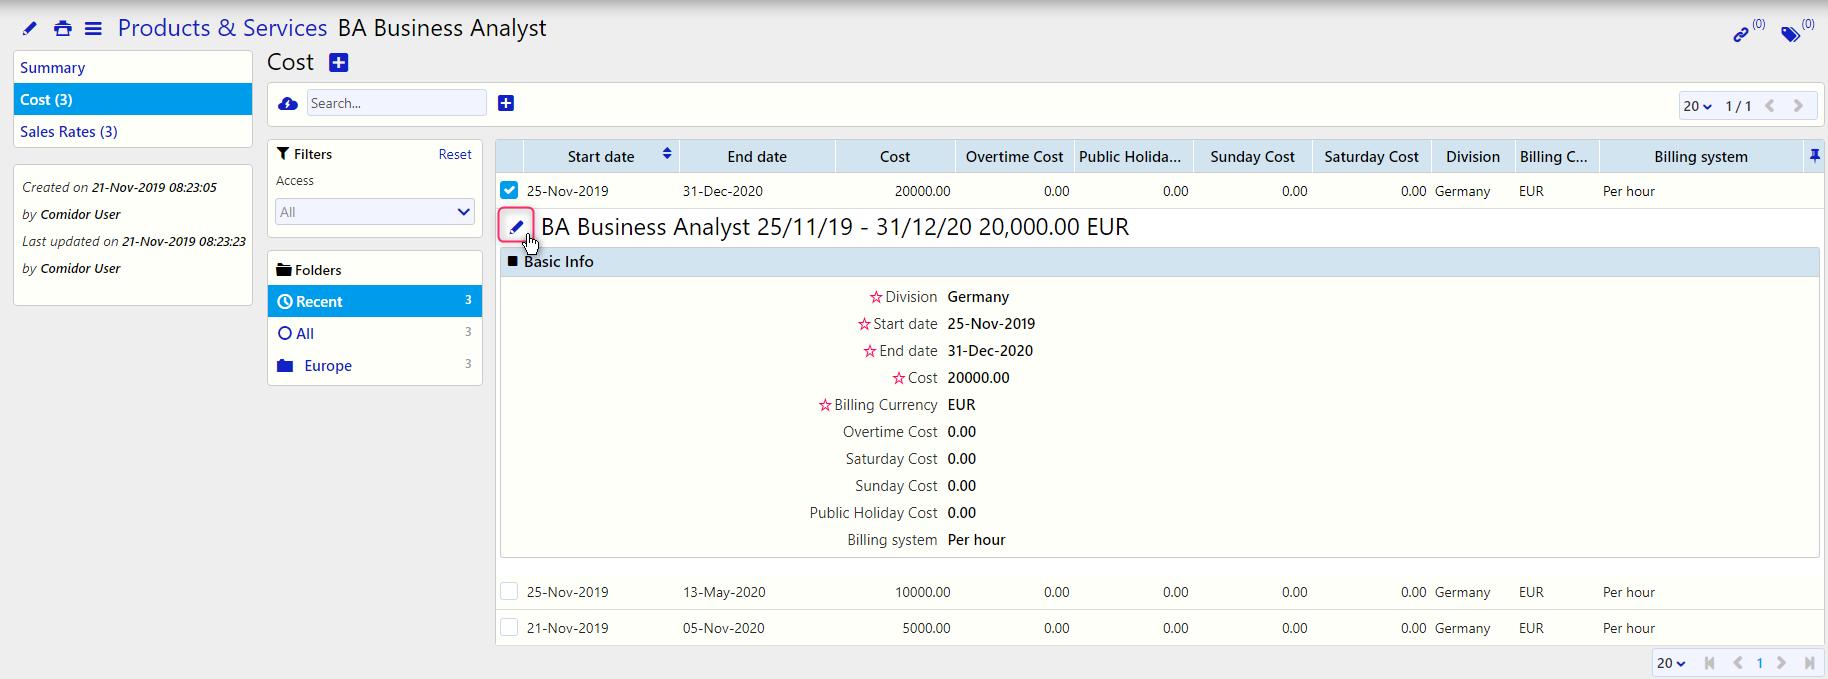 BA Business Analyst / Comidor Digital Automation Platform